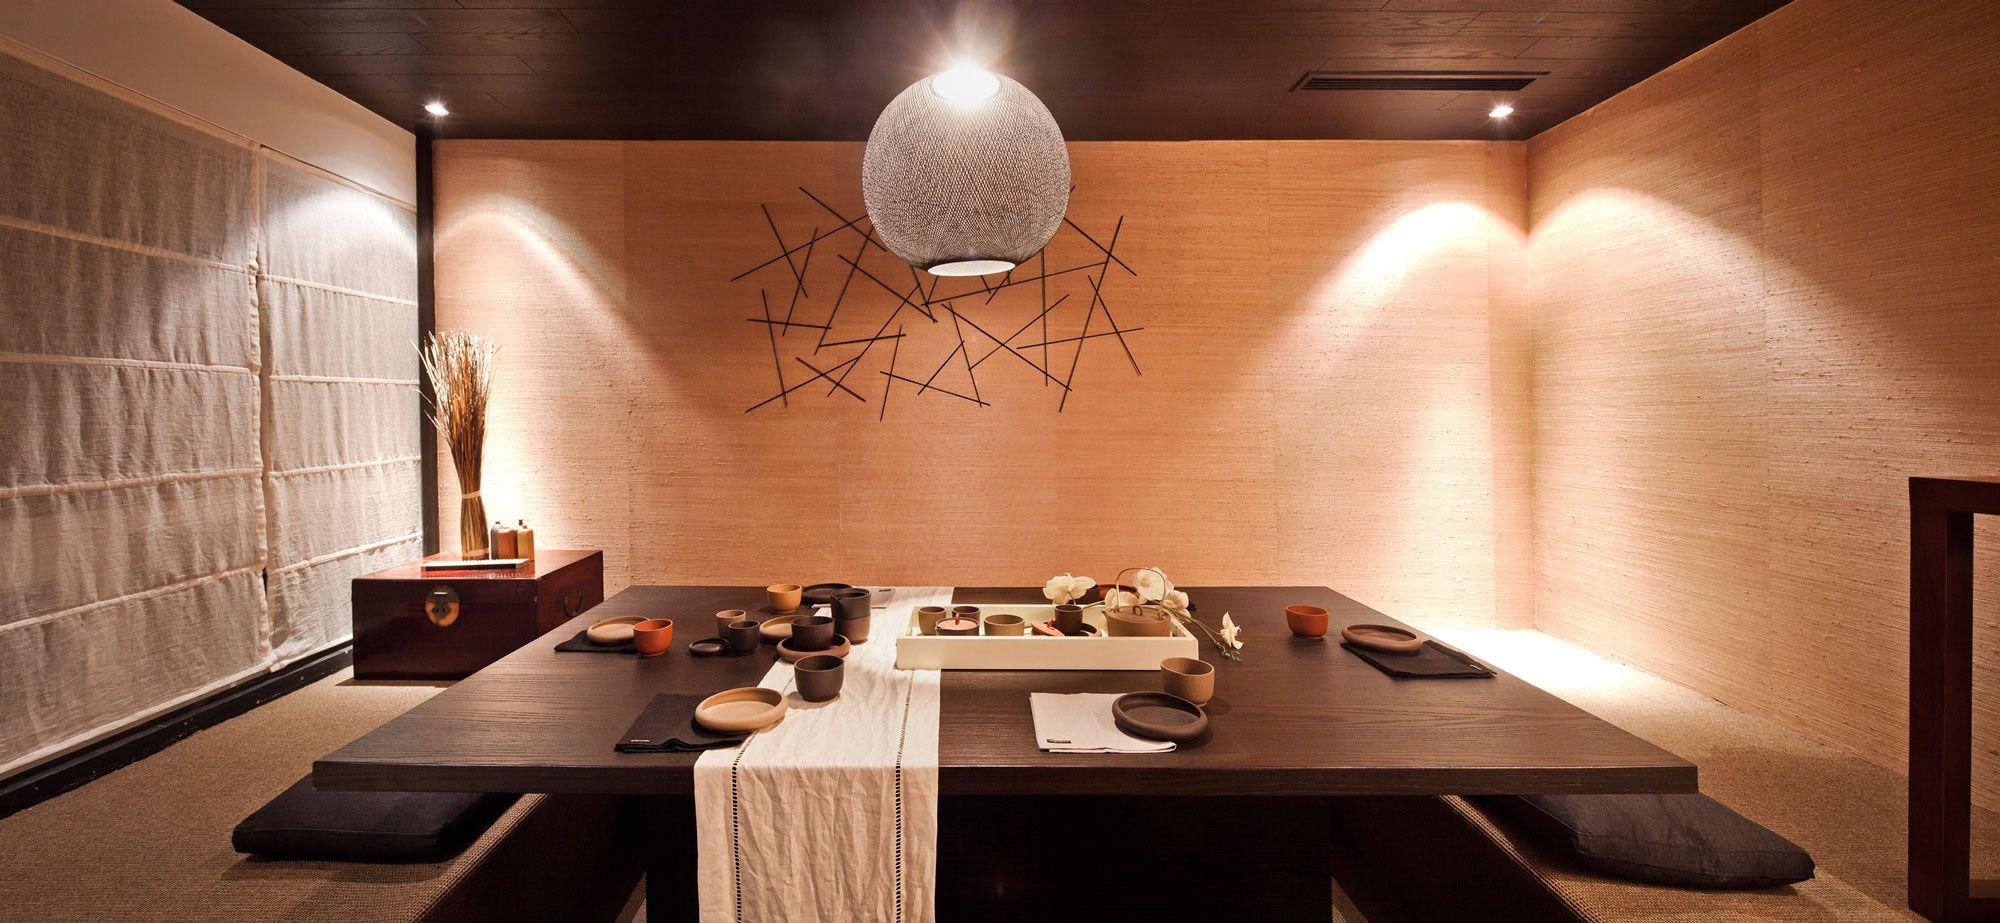 Breathtaking Japanese Dining Room Interior Design Ideas Plus Huge Square Coffee Table